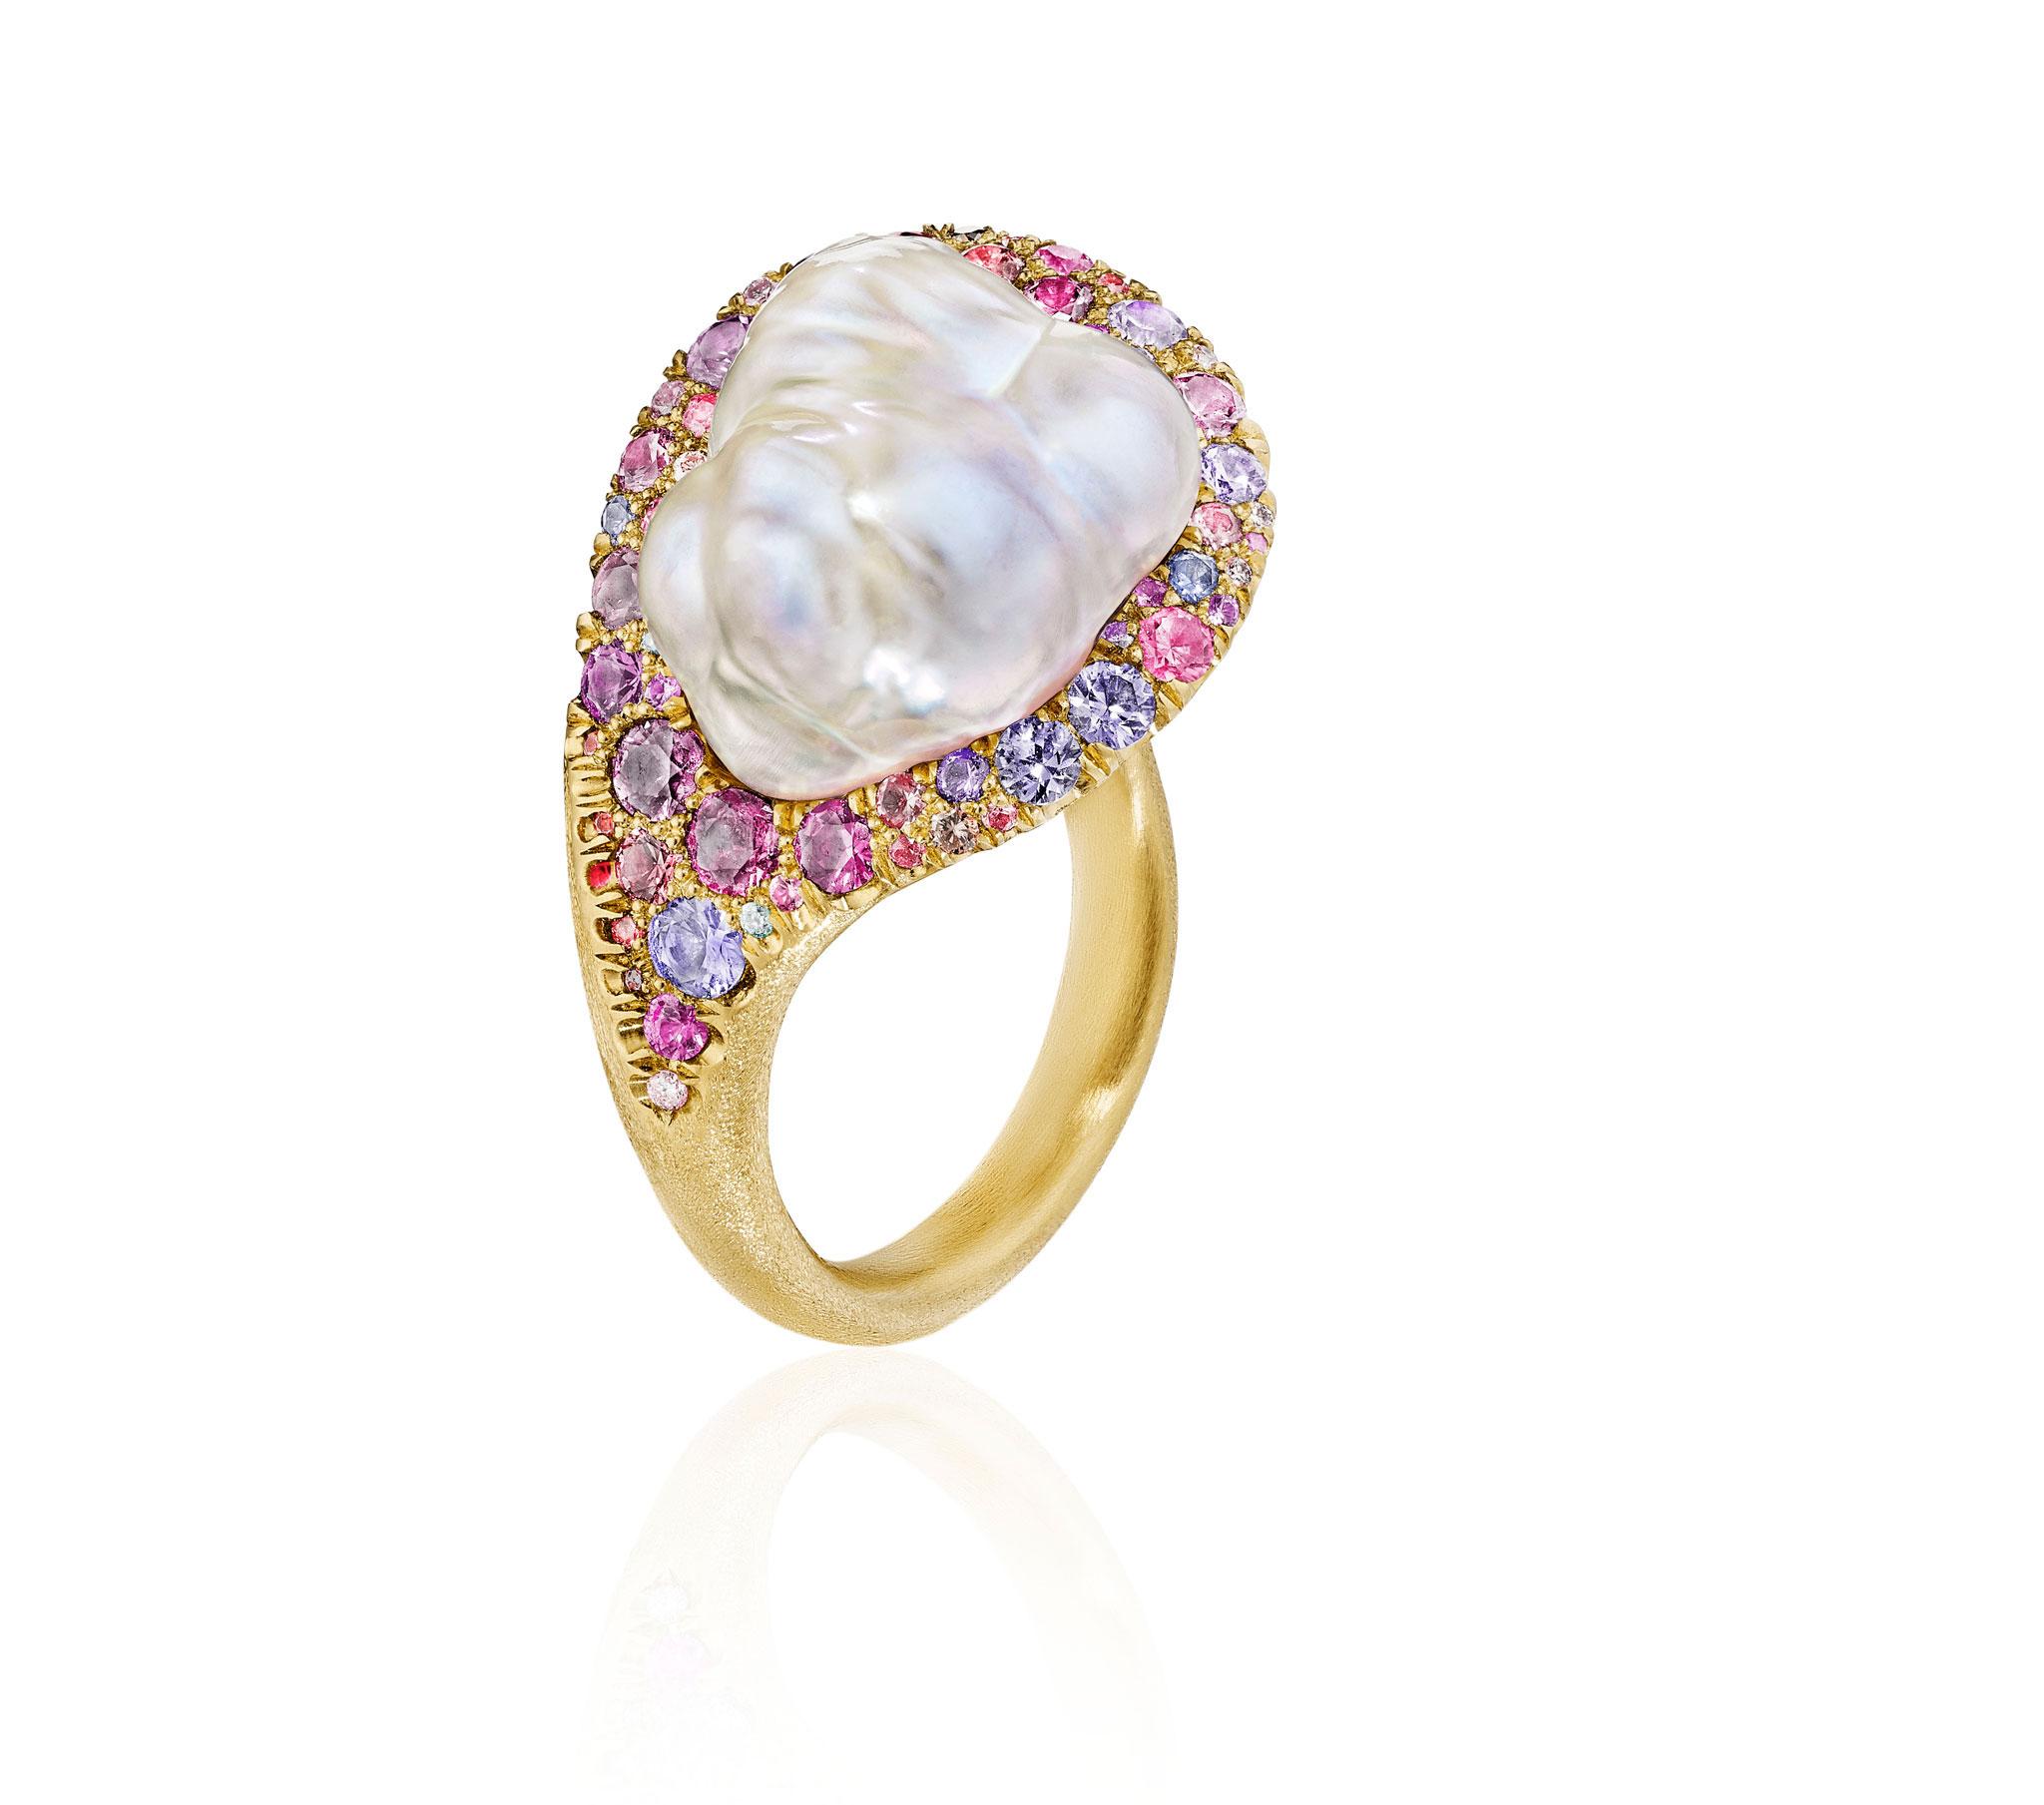 NaomiSarna PearlRing MulticolorGems HiRes Antfarm 1101NS65298 crop opt | International Award-Winning Jewelry Artist Naomi Sarna In Tucson for AGTA GemFair